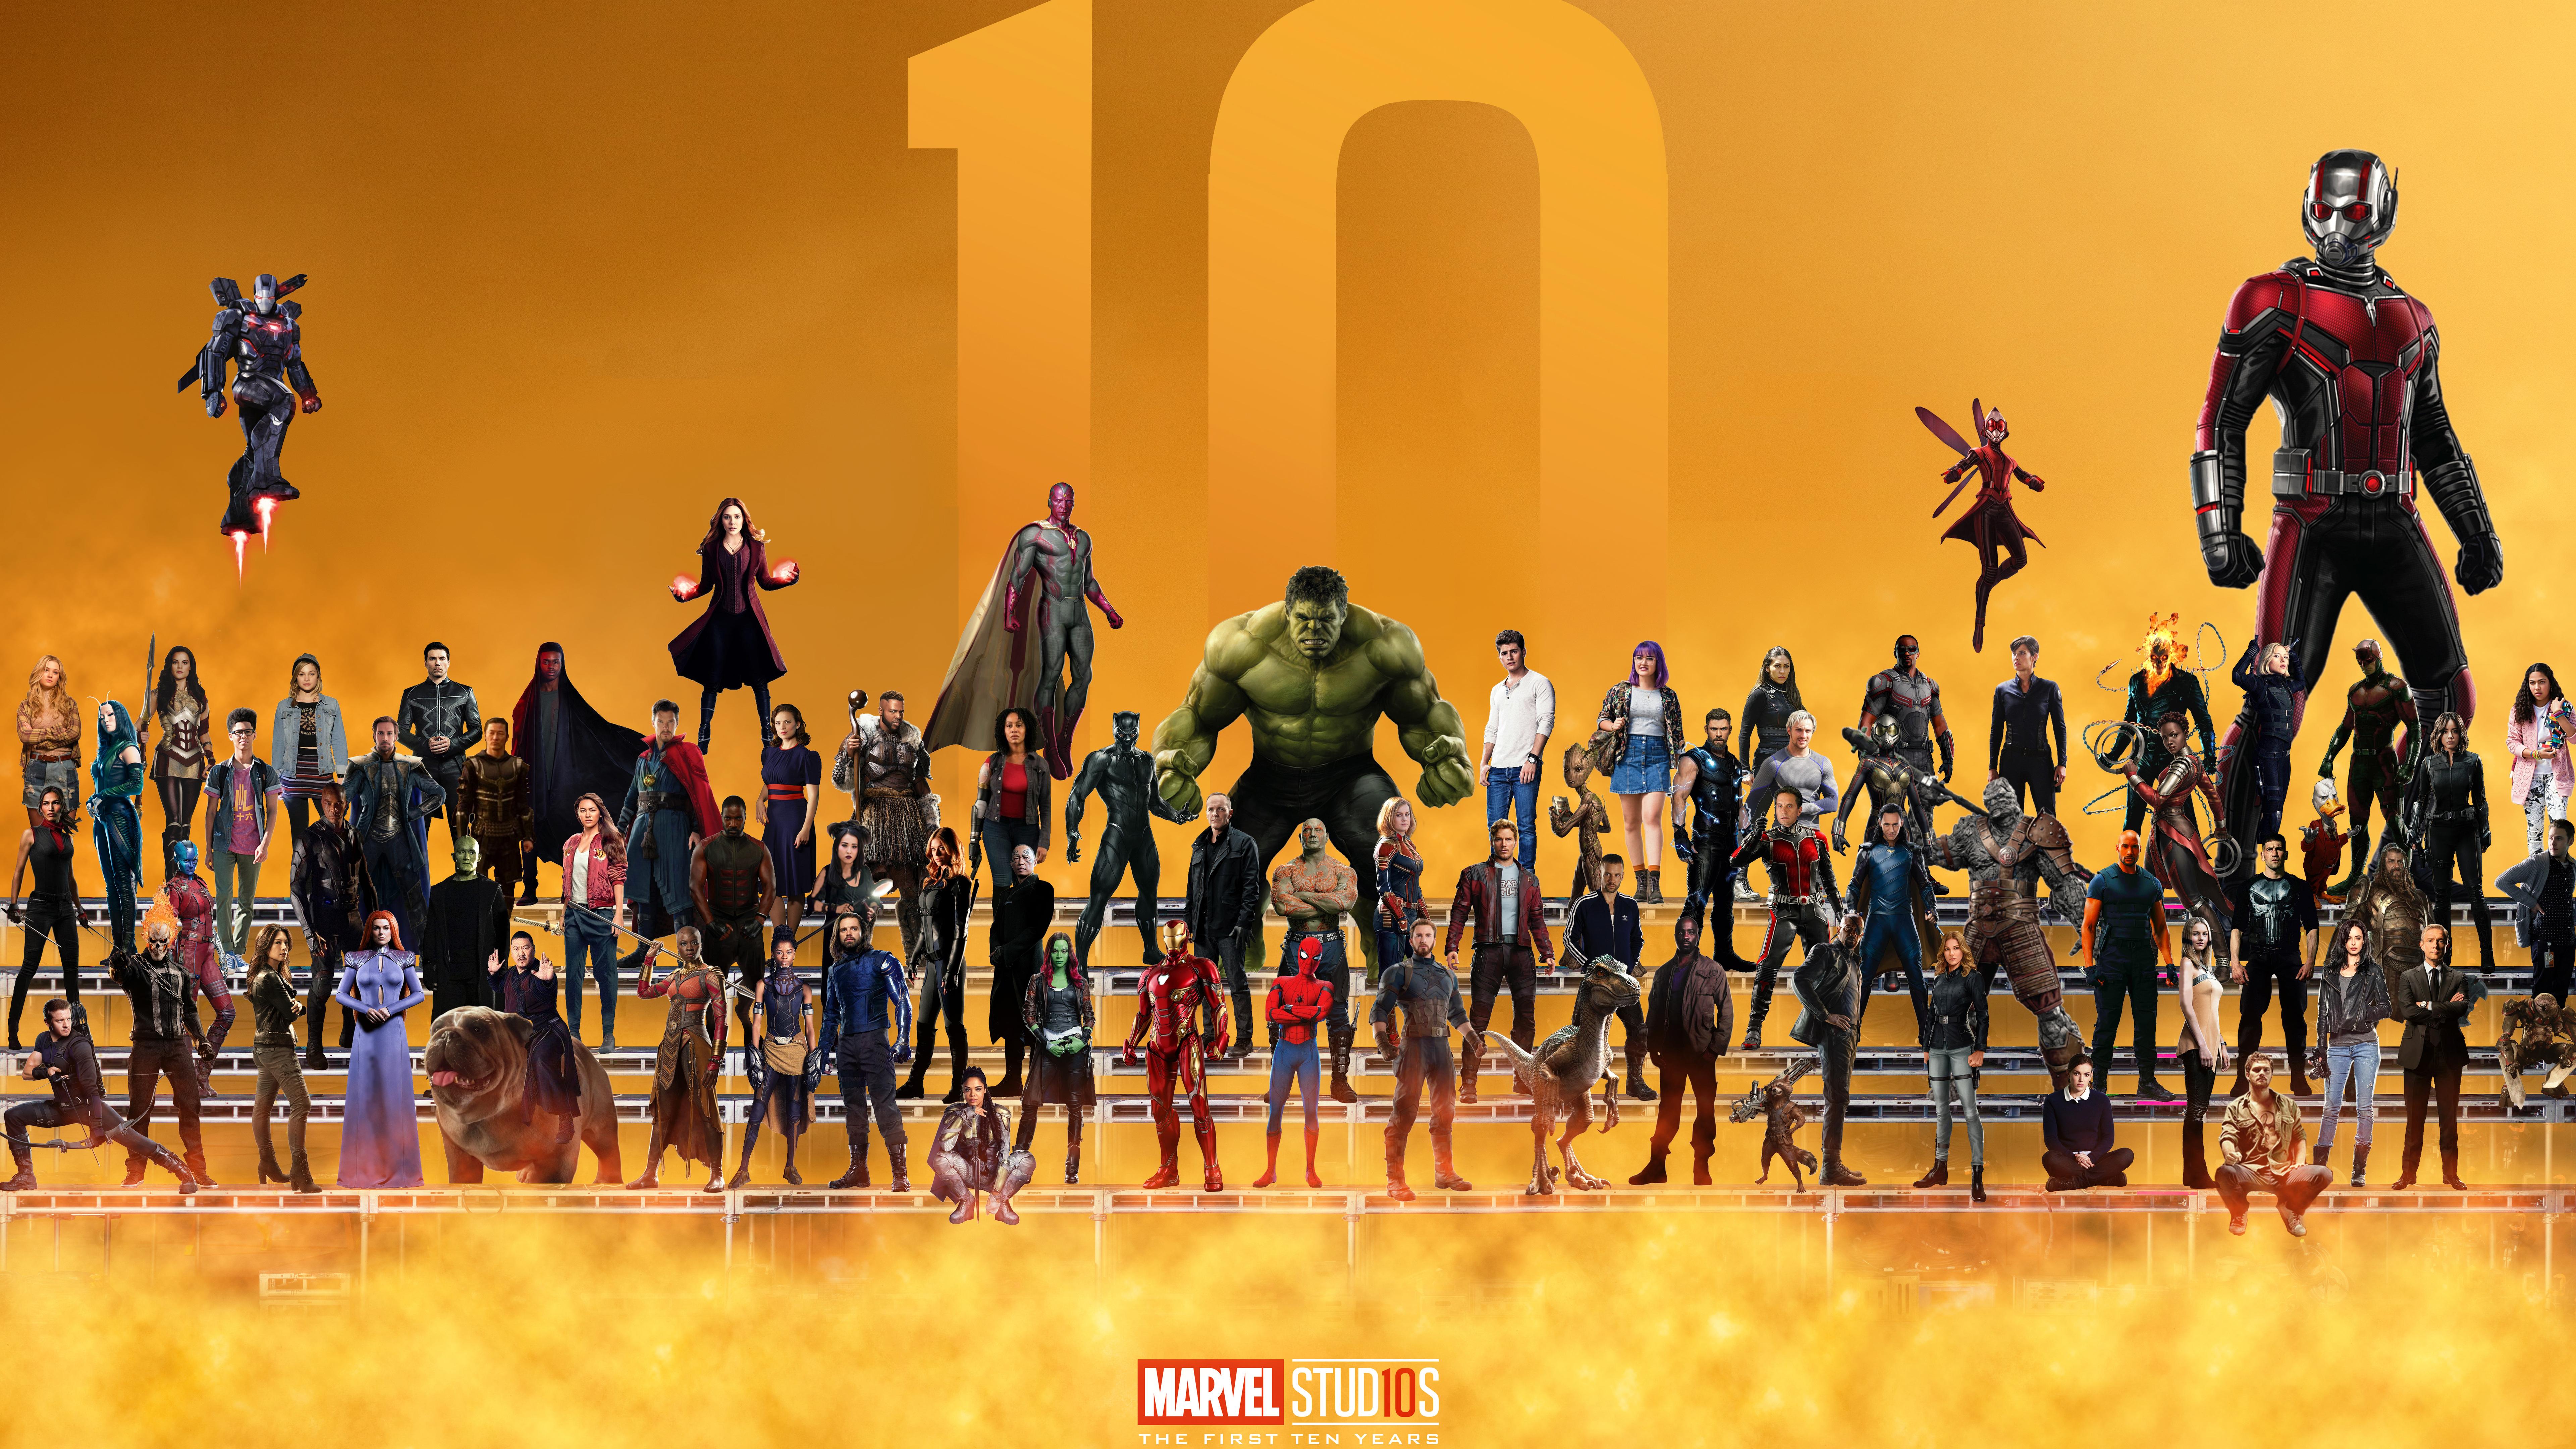 7680x4320 Marvel Superheroes 10 Year Anniversary Artwork 8k